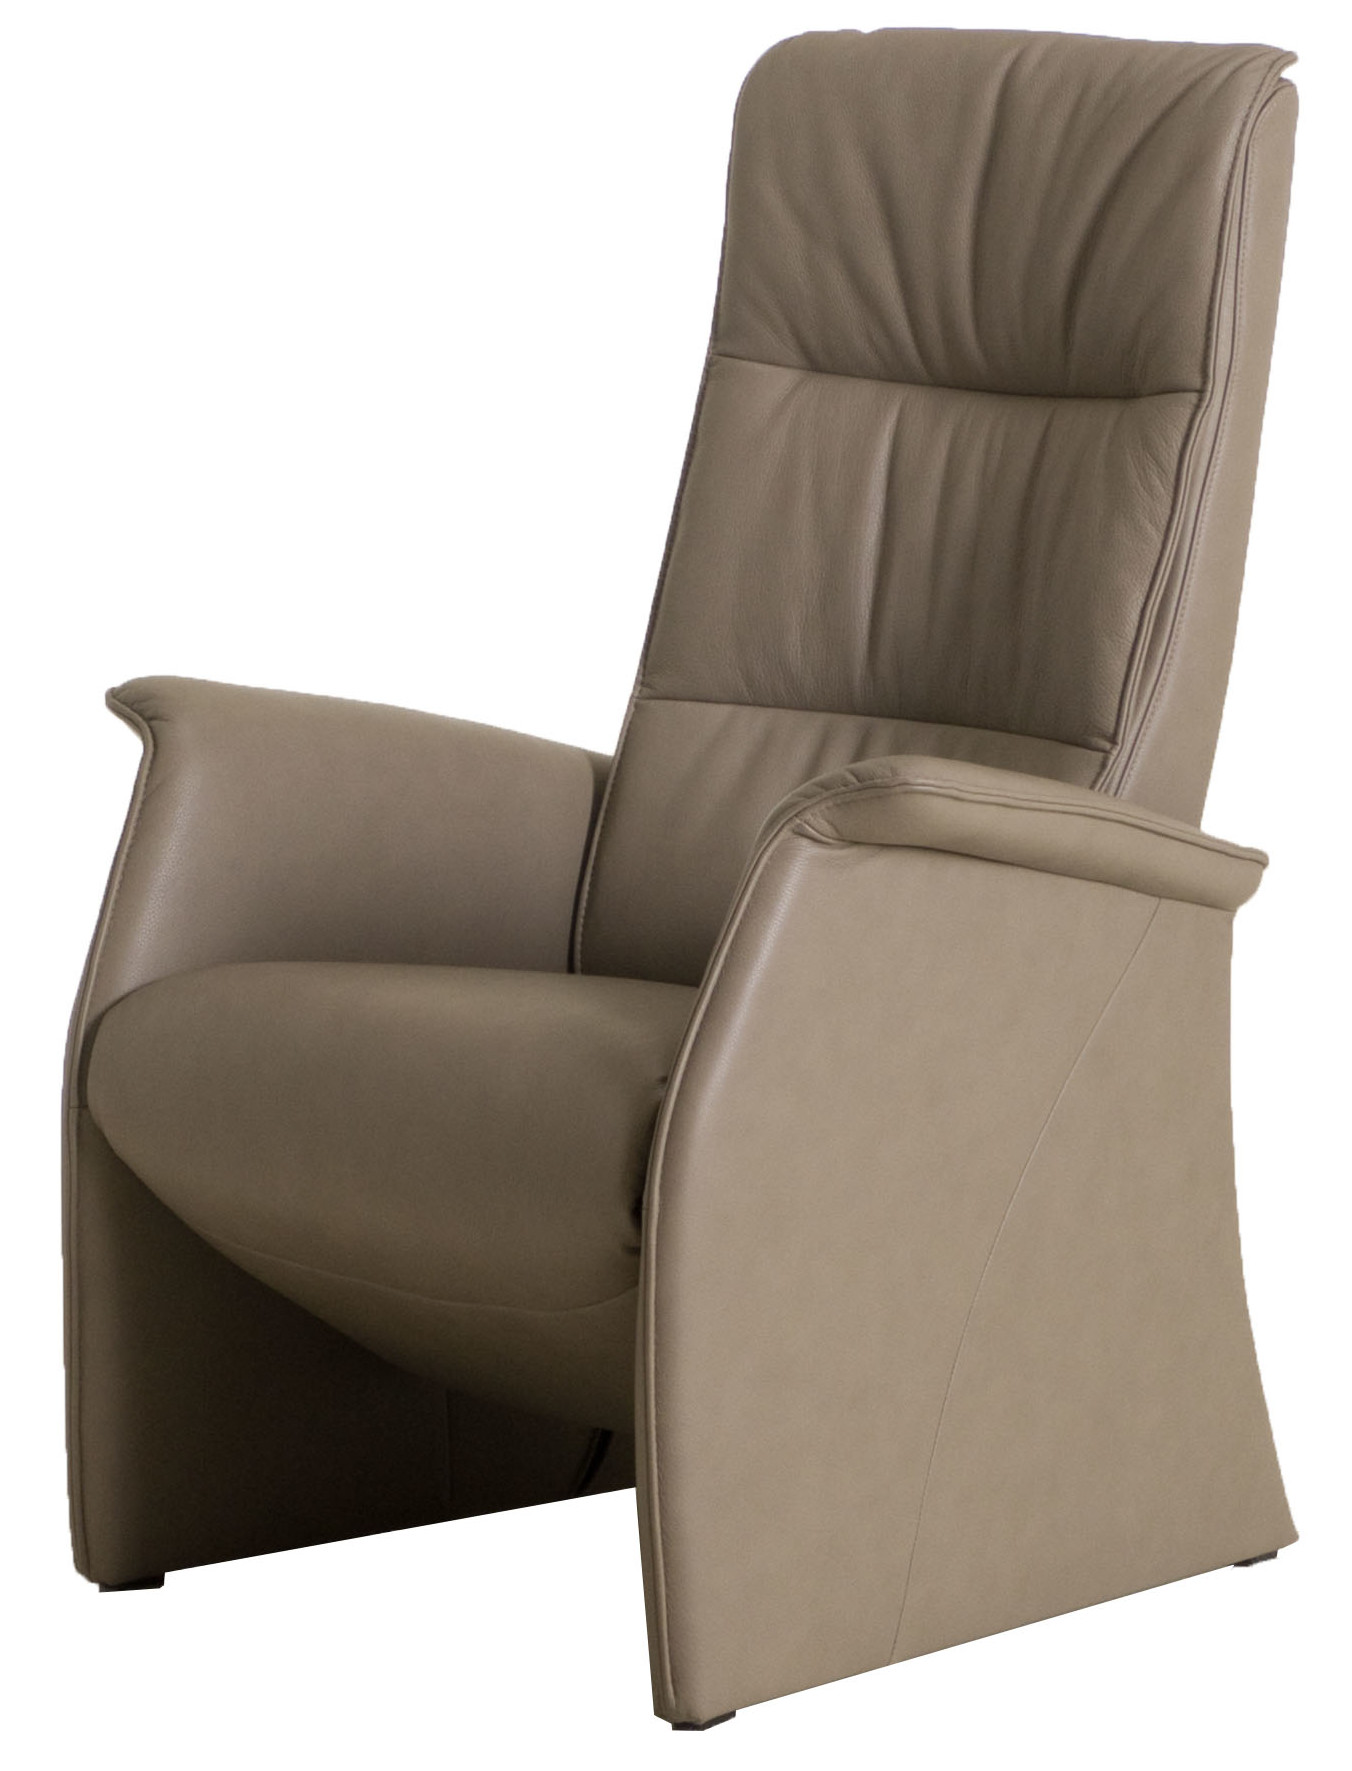 Relaxstoel Easysit D110